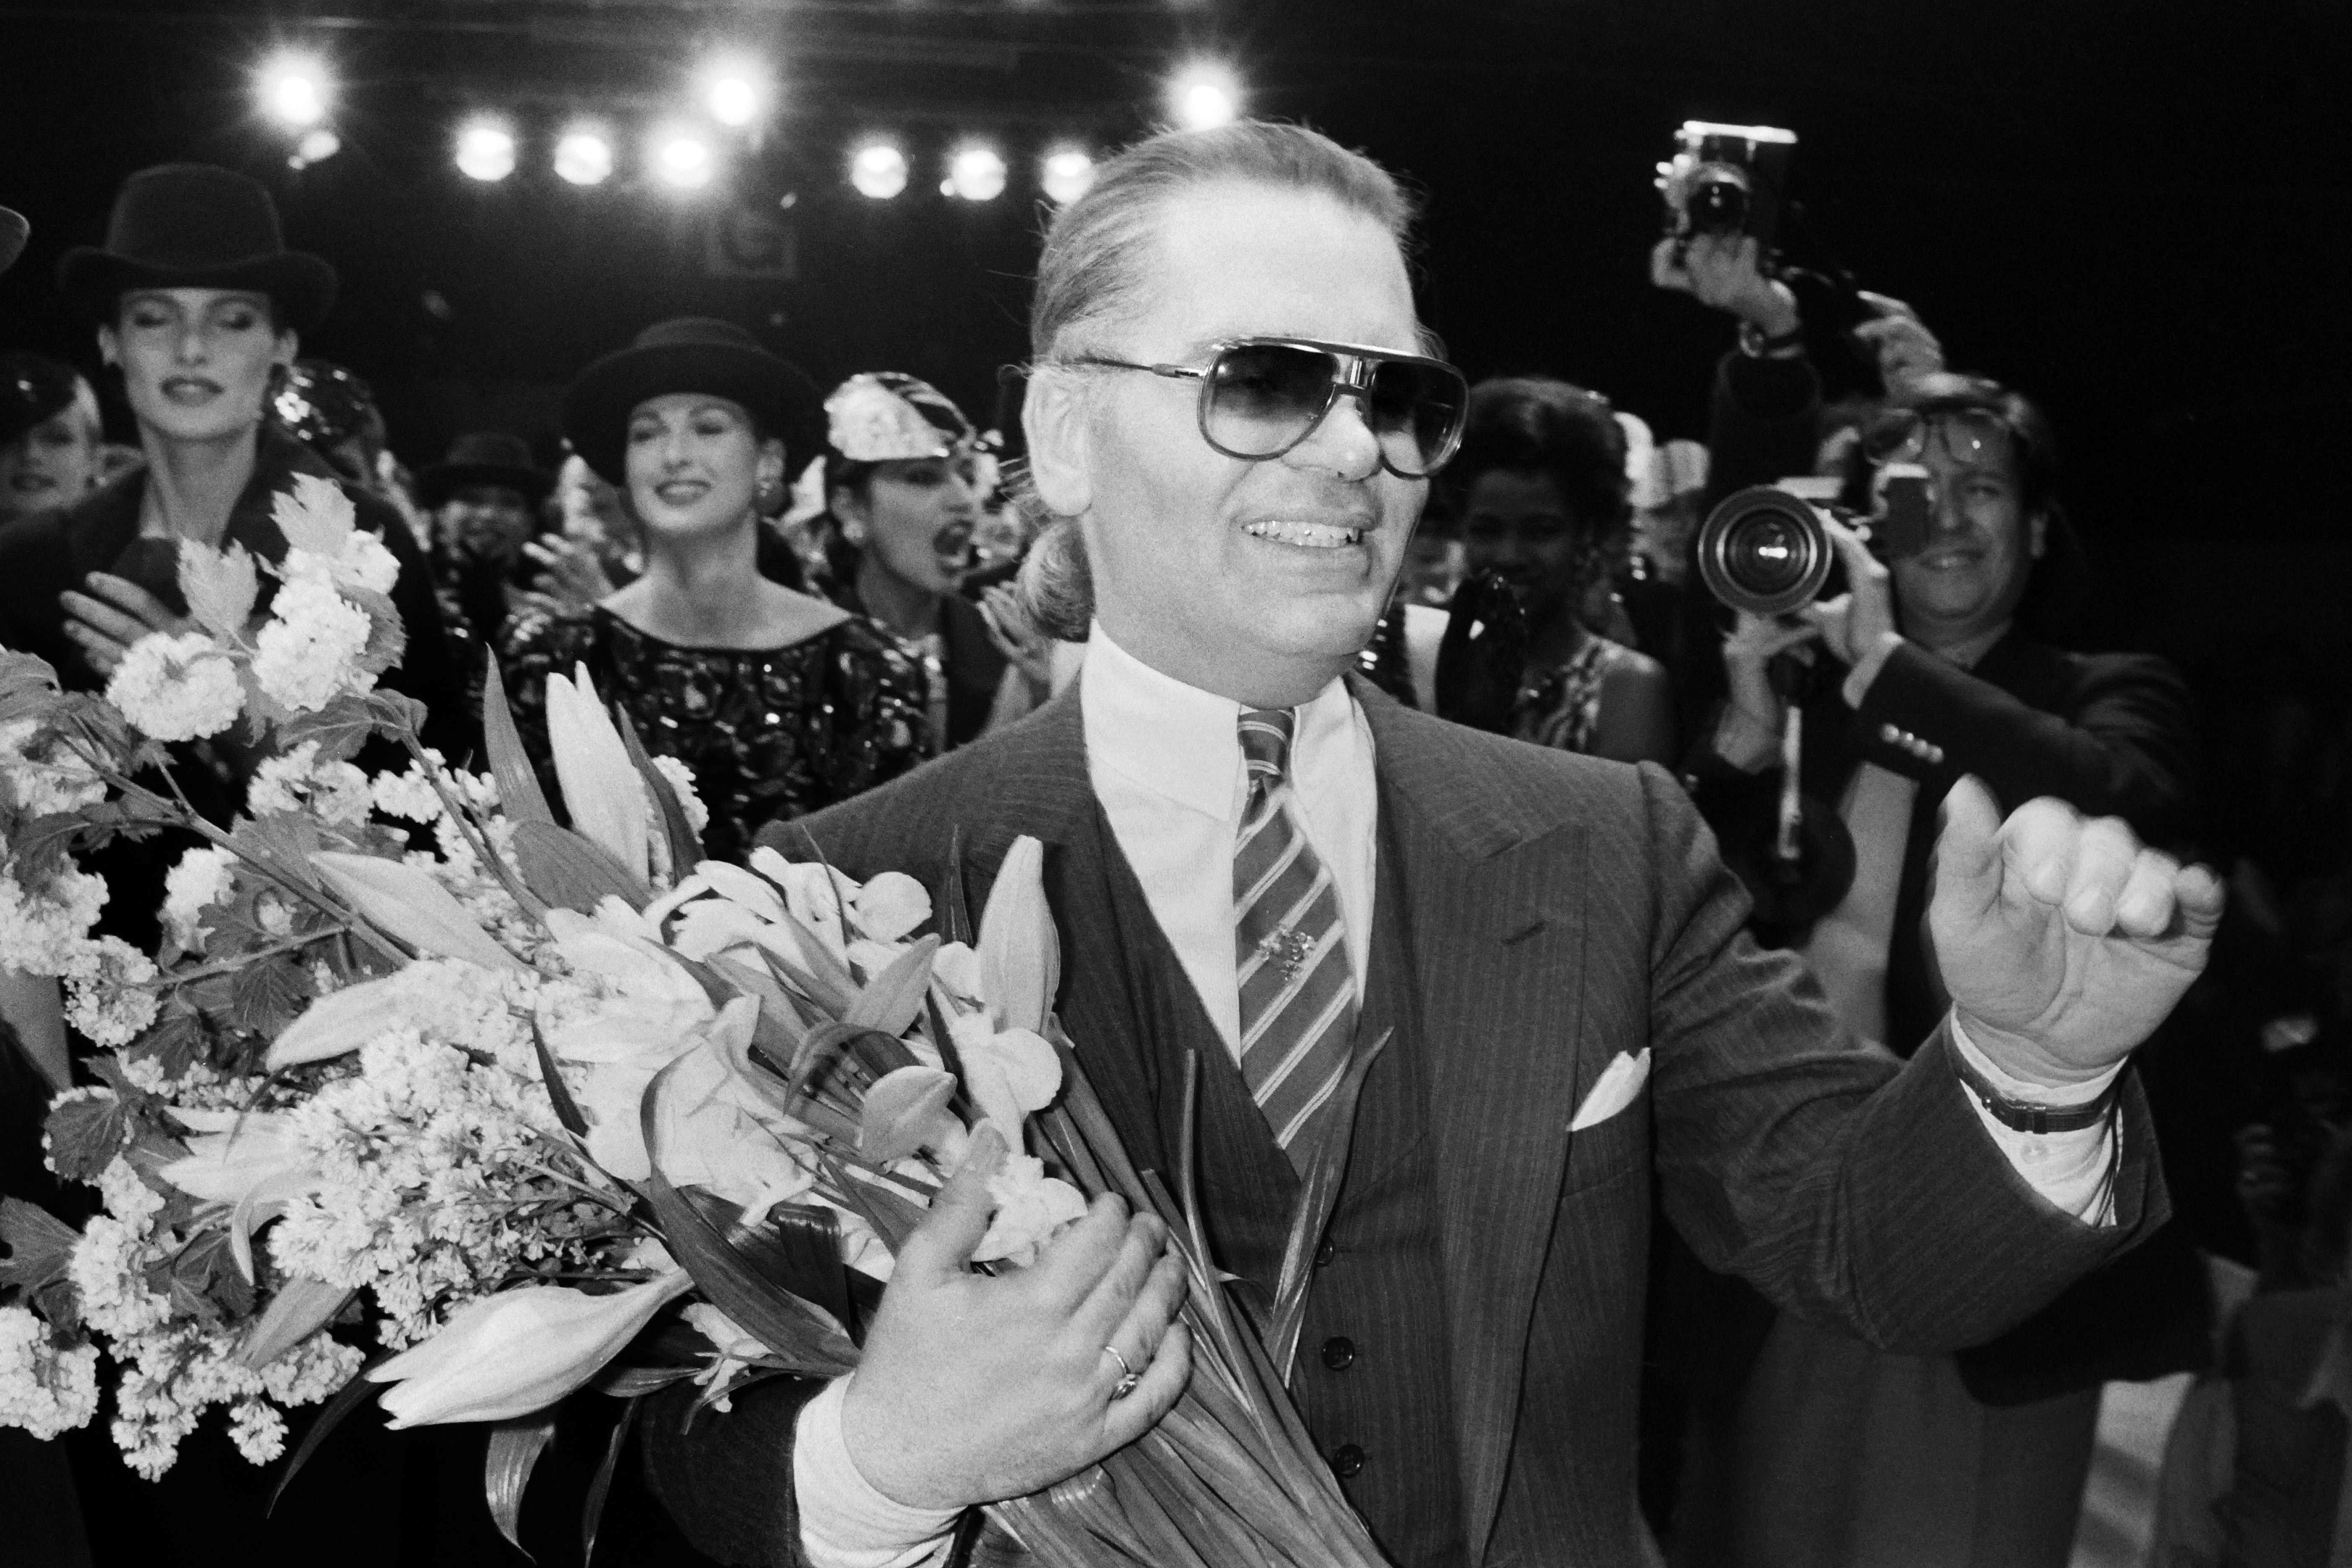 Карл Лагерфельд, Германия, 1984 год